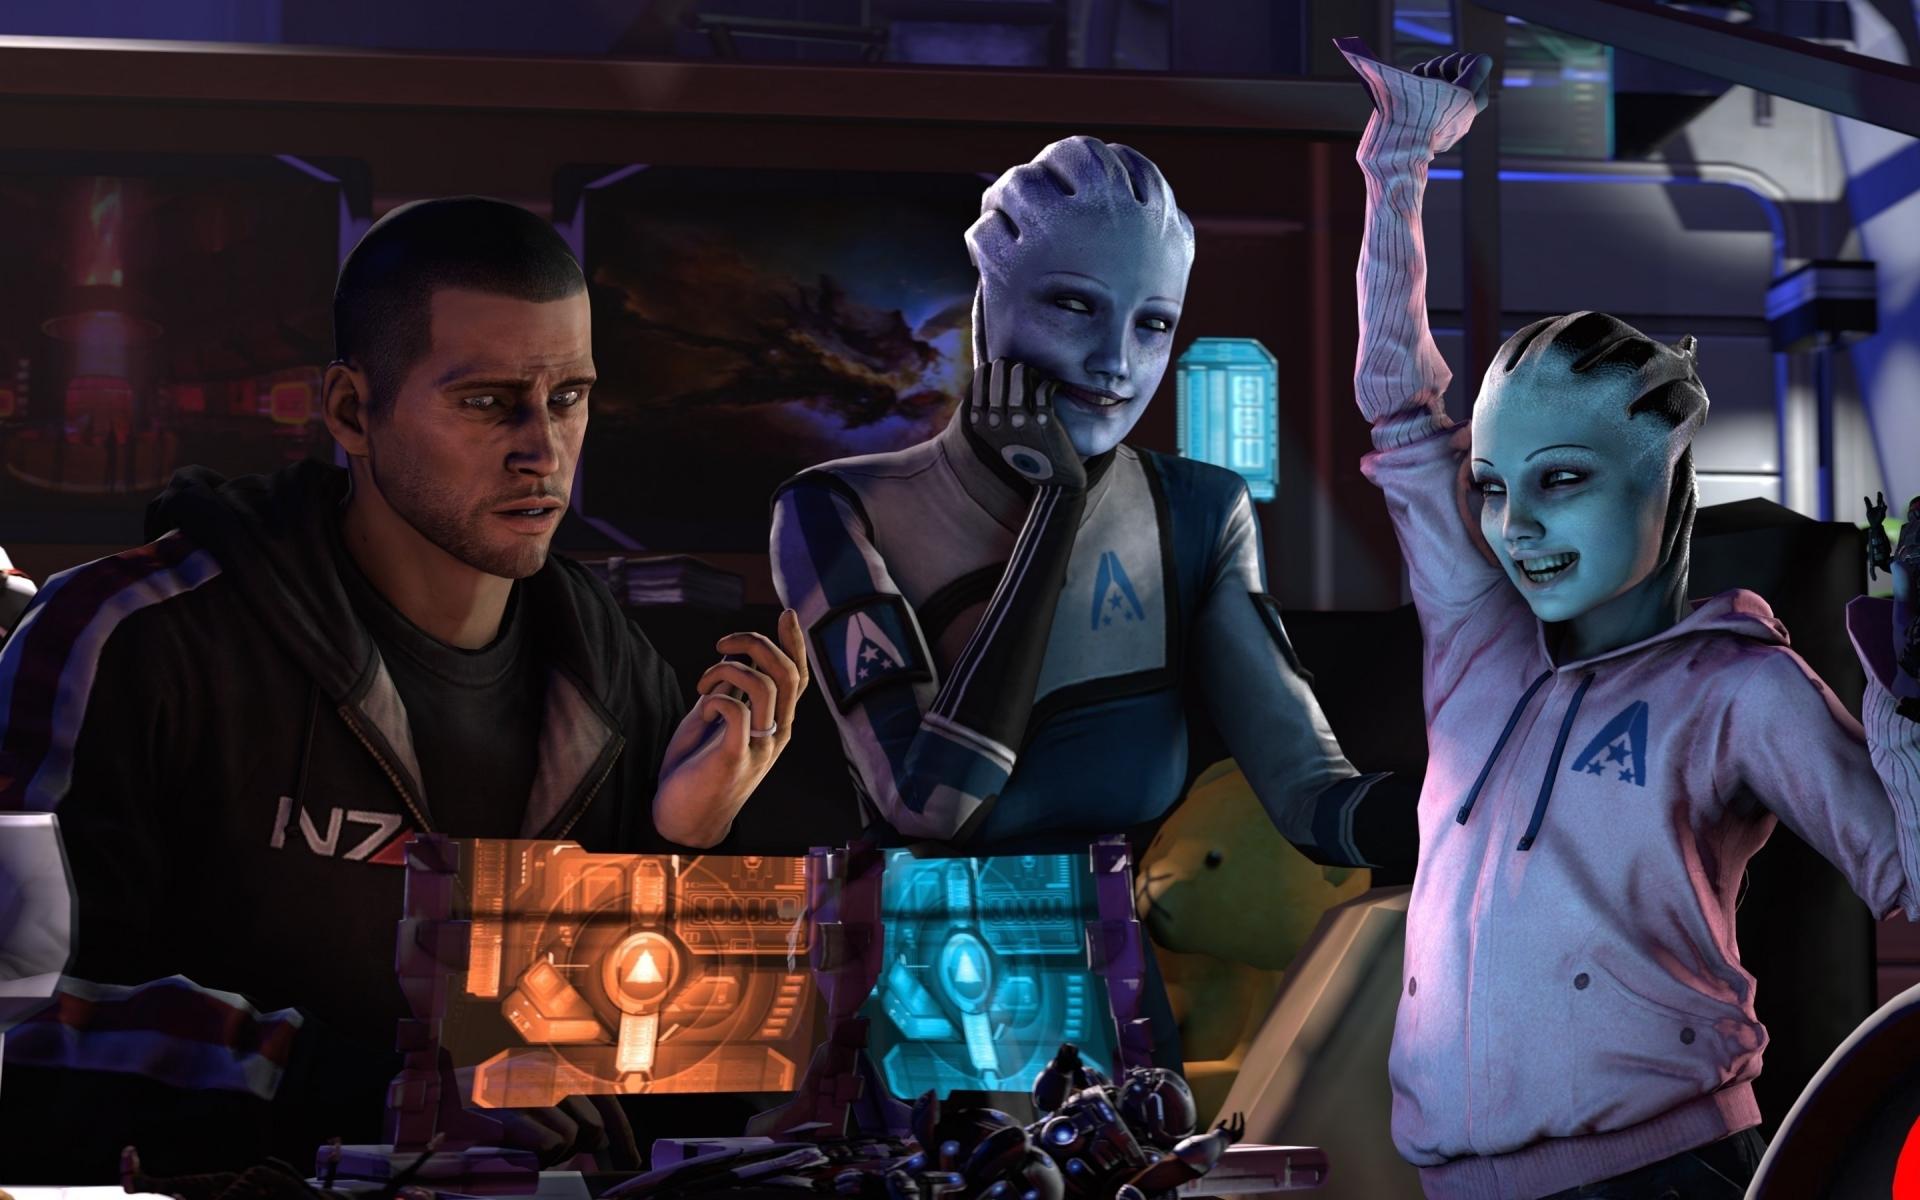 46+] Mass Effect HD Wallpapers on WallpaperSafari